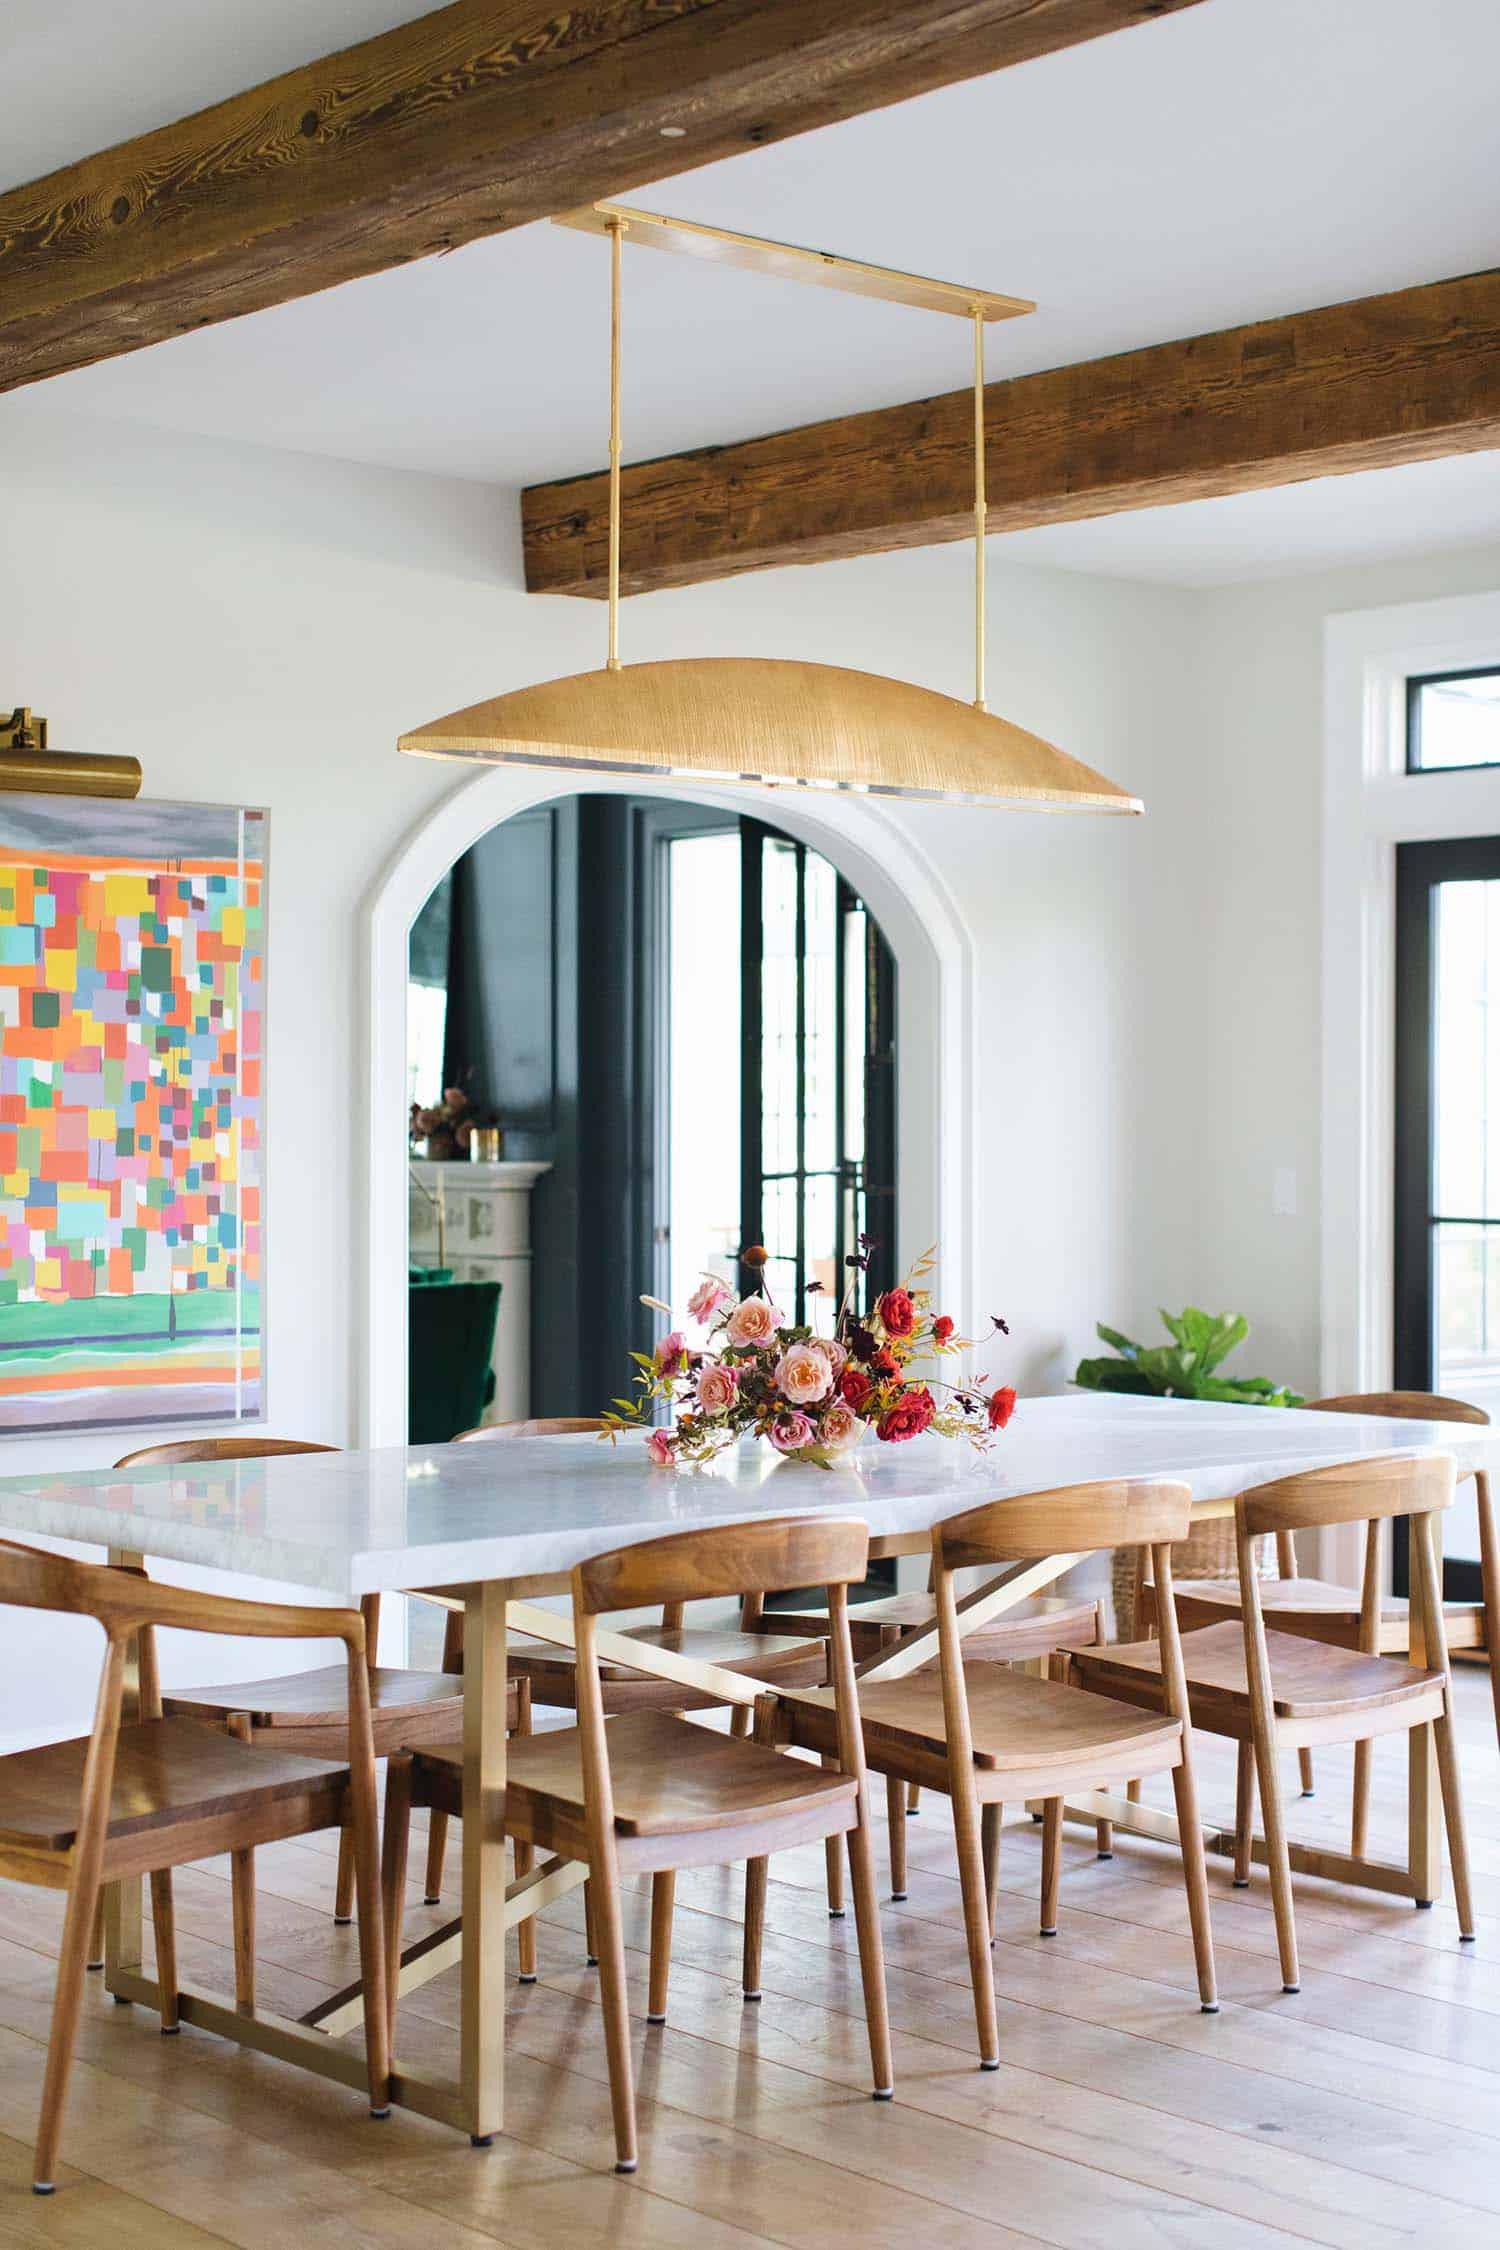 Modern Farmhouse Style-Jean Stoffer Design-14-1 Kindesign